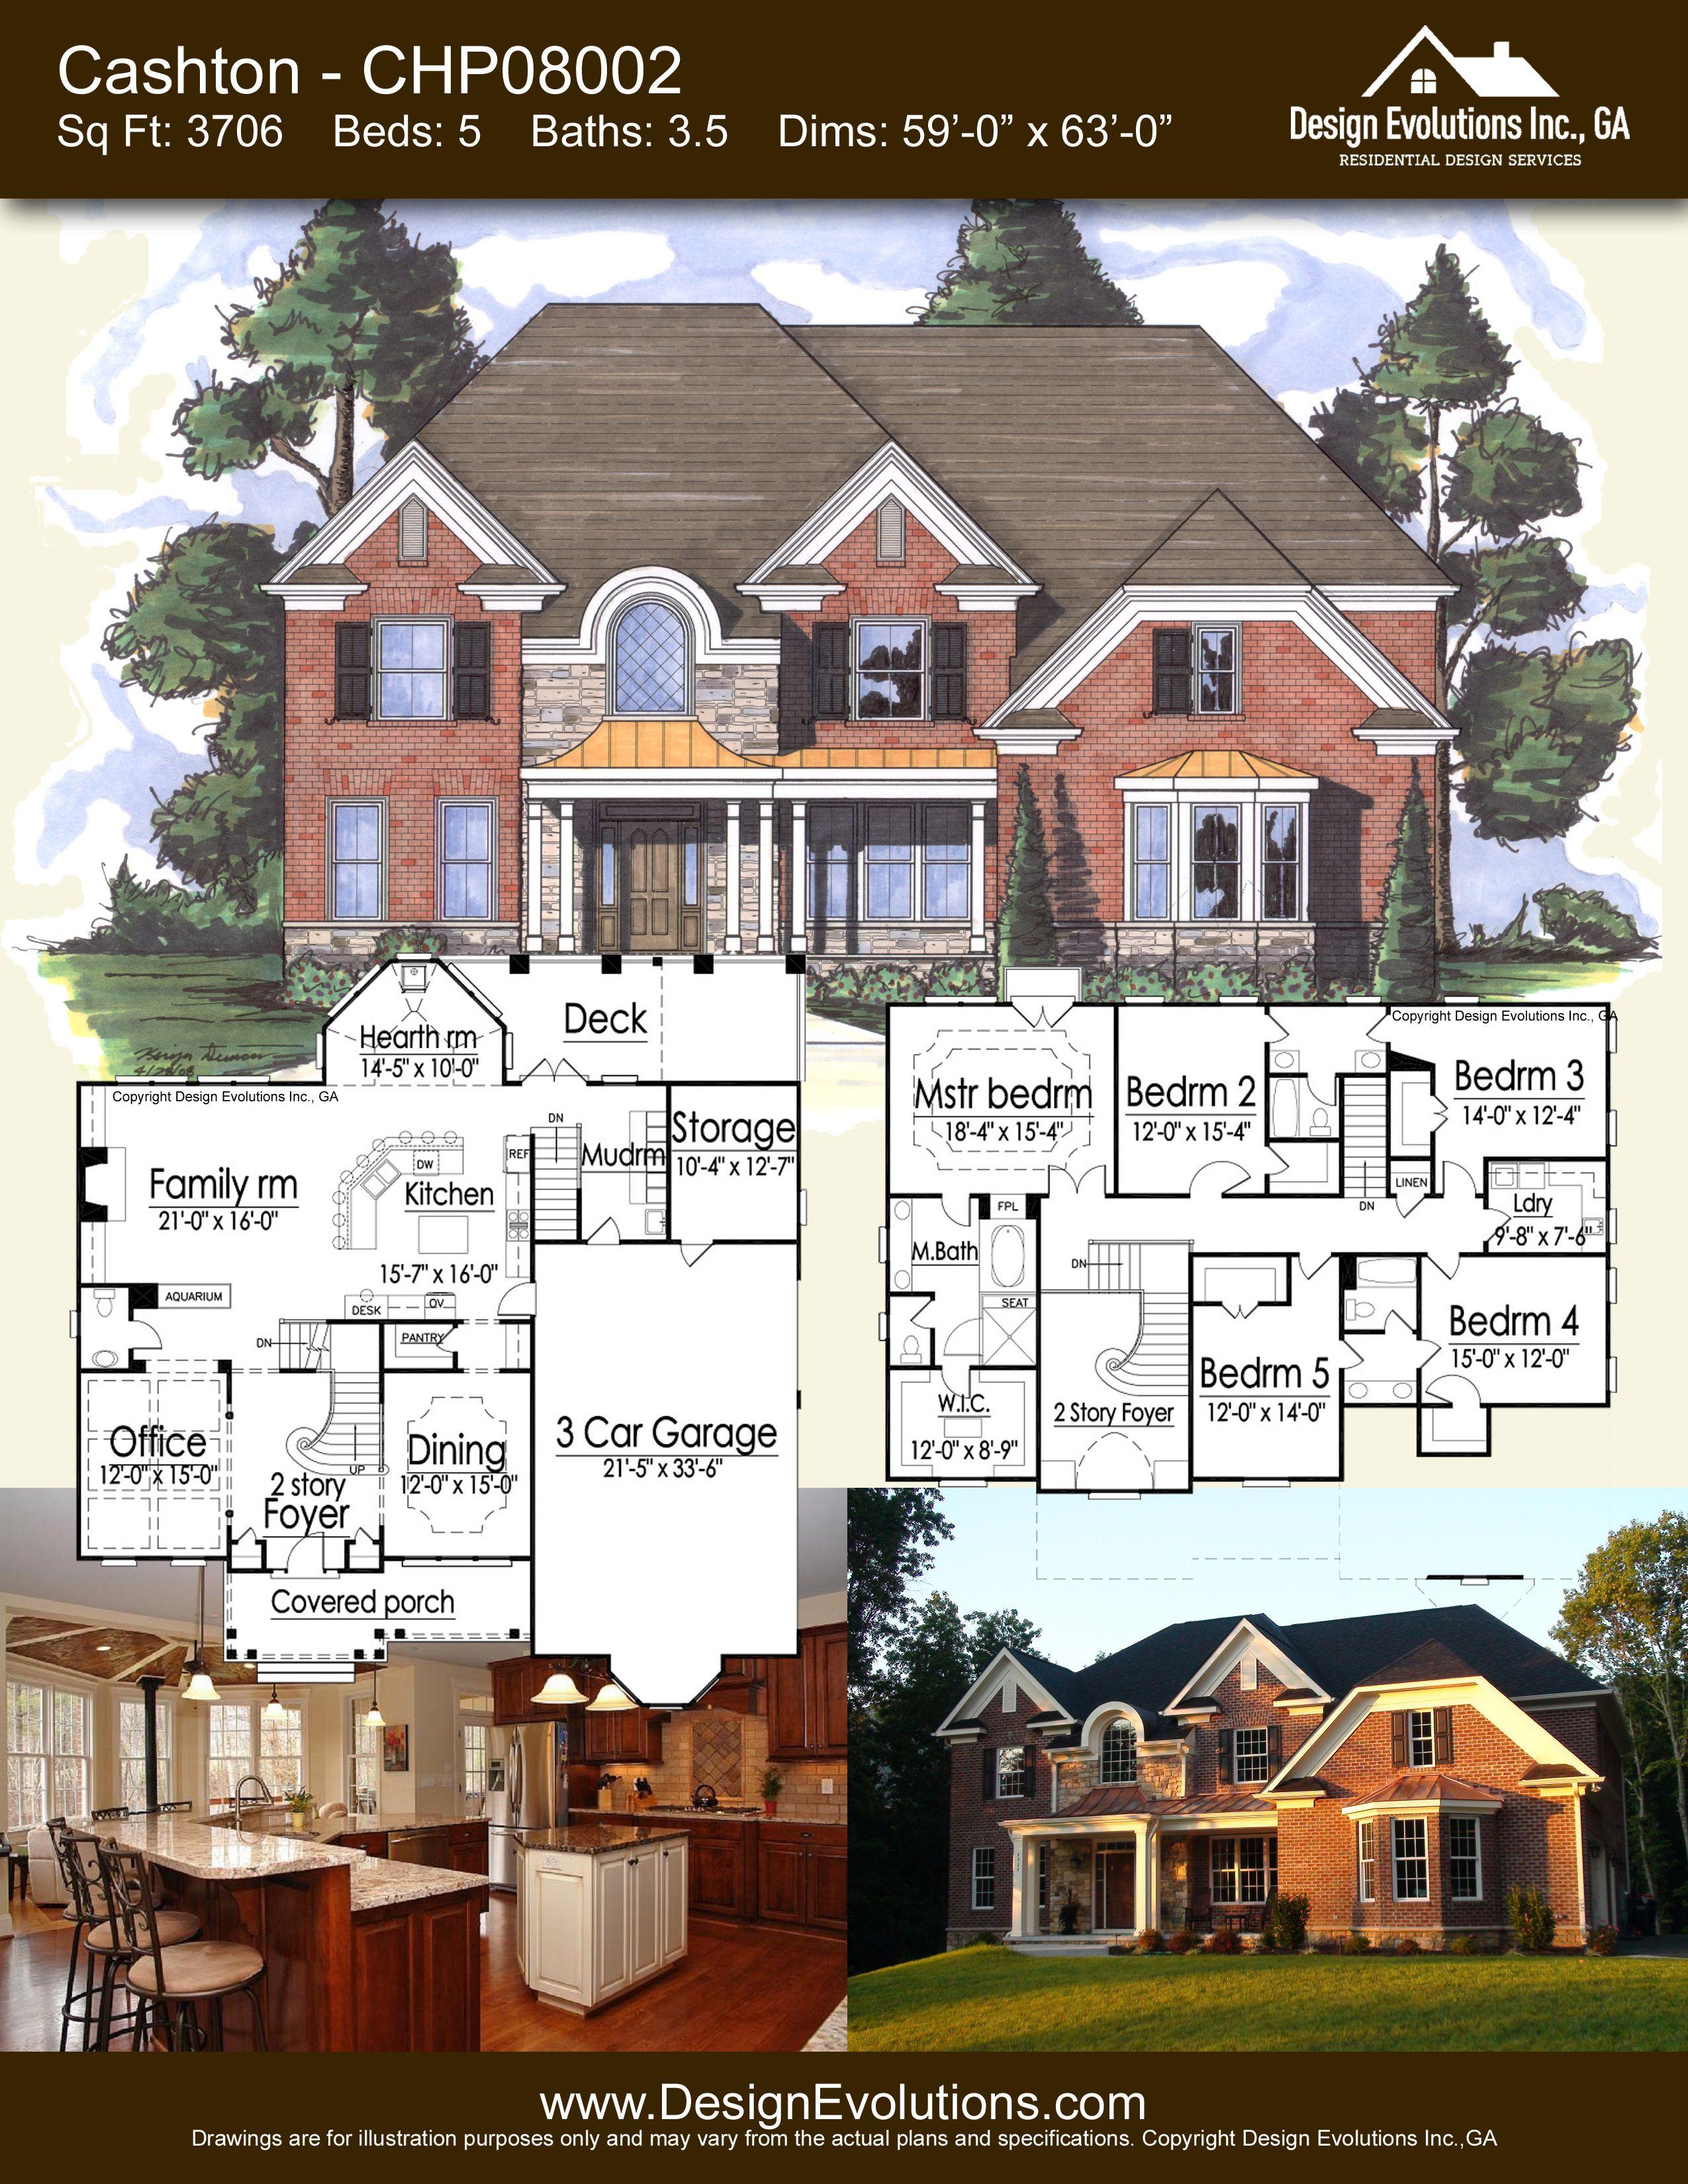 Cashton house plan – CHP 5 bed 3 1 2 bath 3706 sq ft luxury home plan